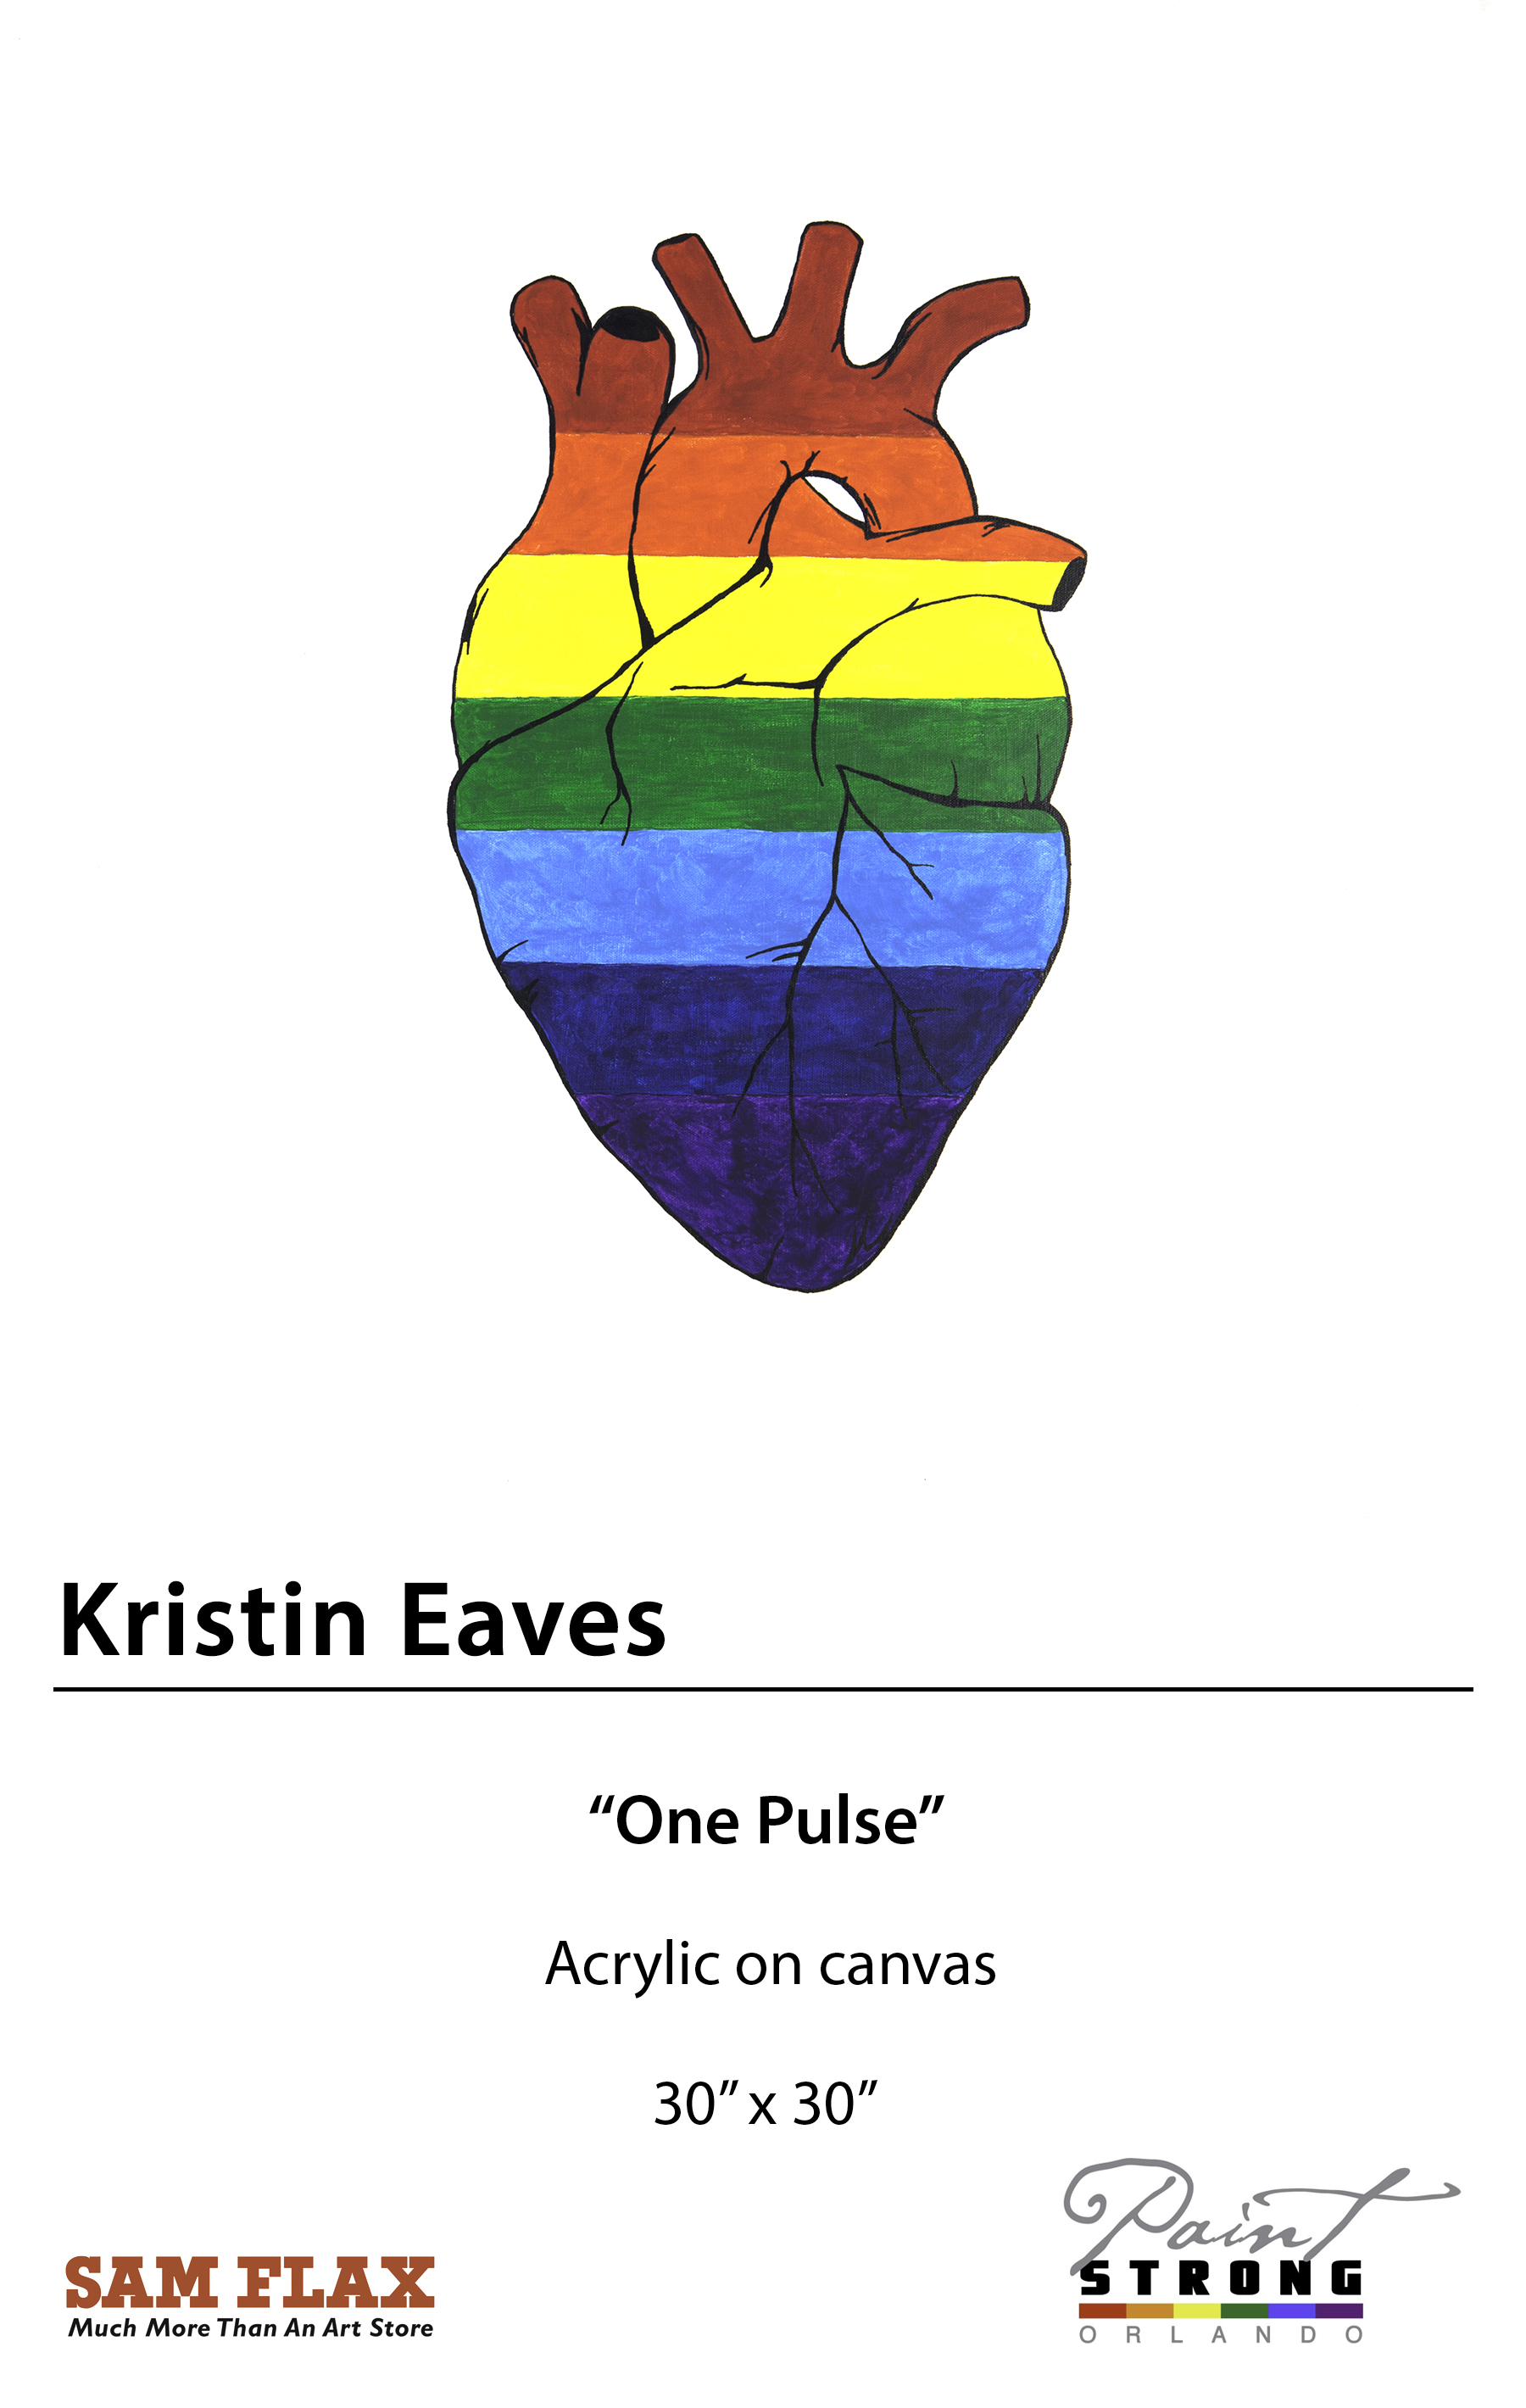 Kristin Eaves